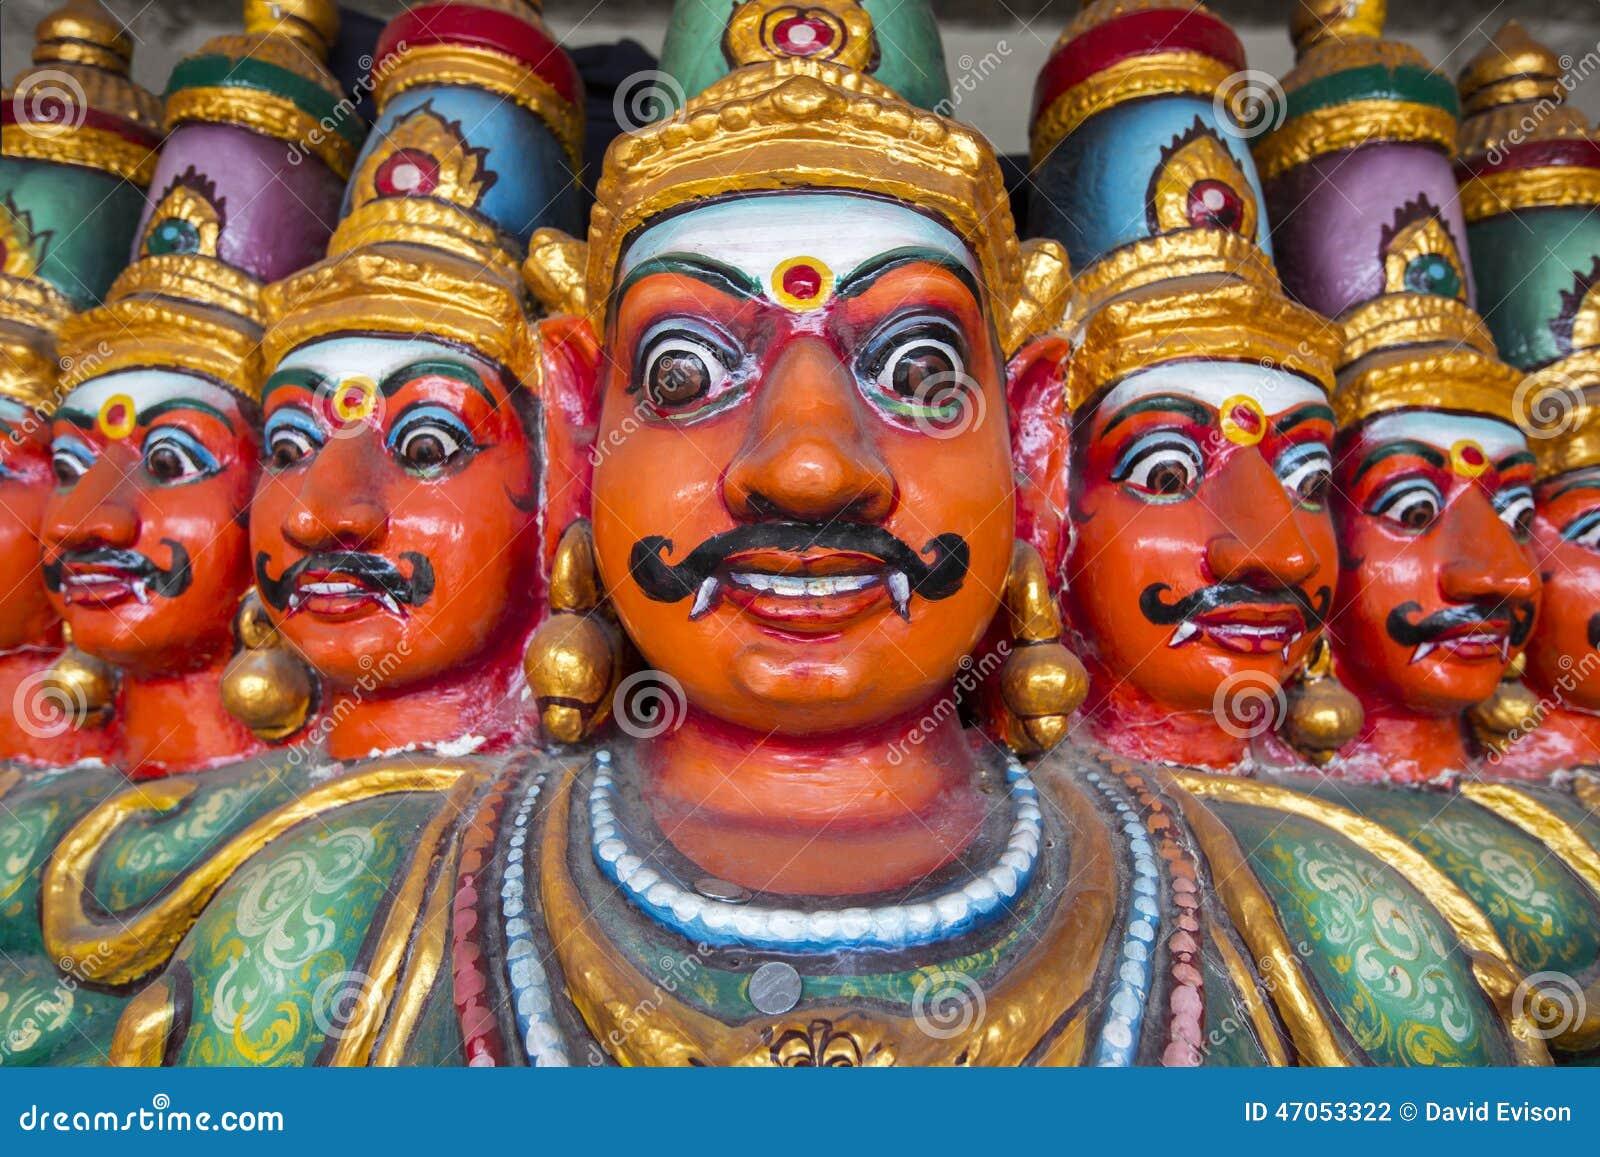 Ten Headed Ravana Vahana In Kapaleeshvarar Temple Chennai India Stock Photography